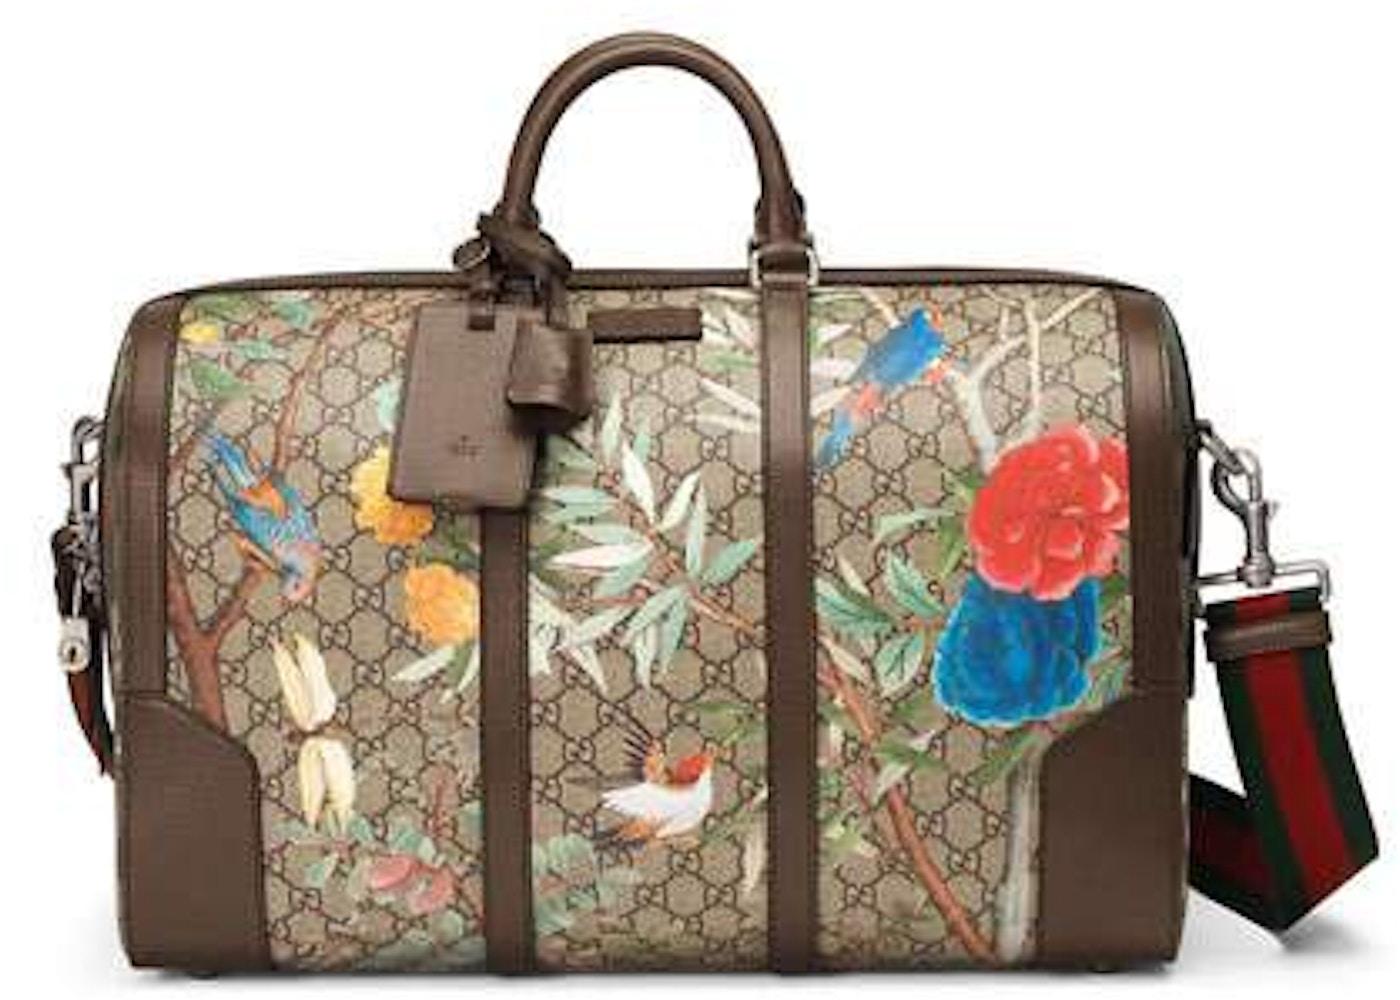 Gucci Duffle Bag Supreme Tian Gg Large